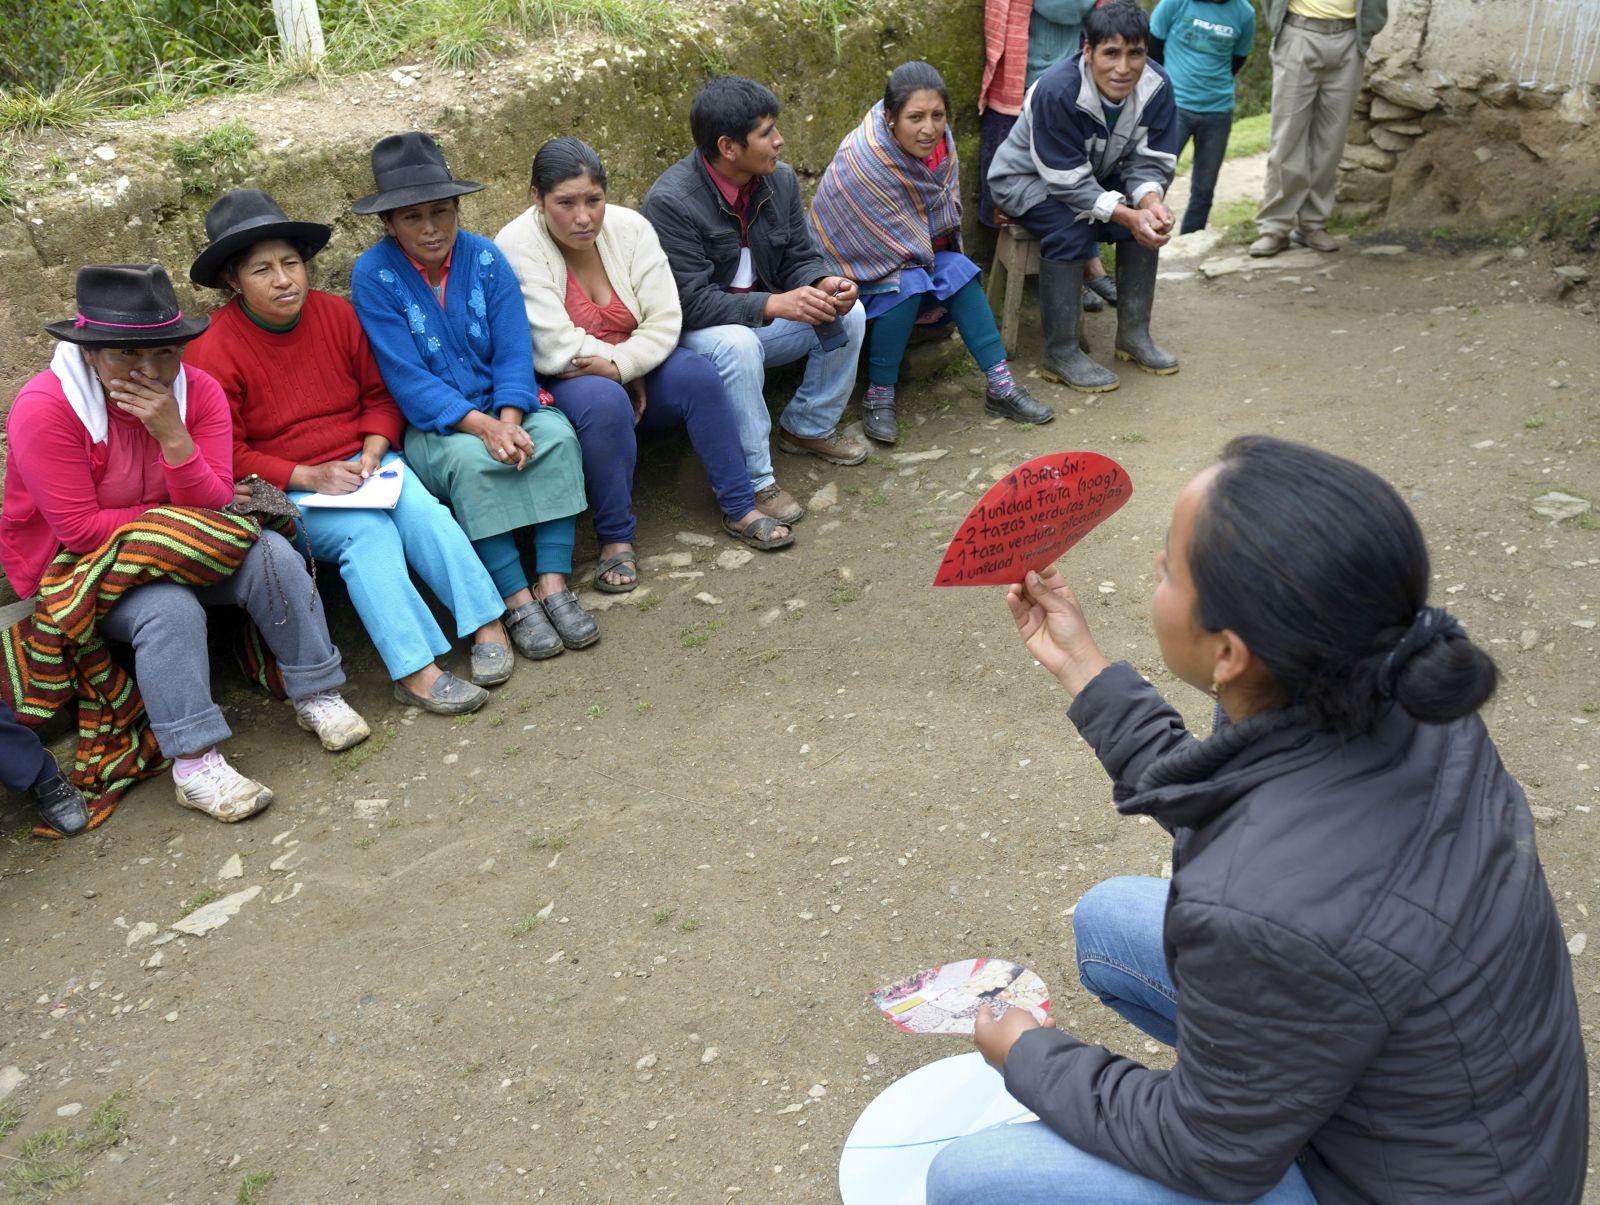 19.Peru270_KOPP131893